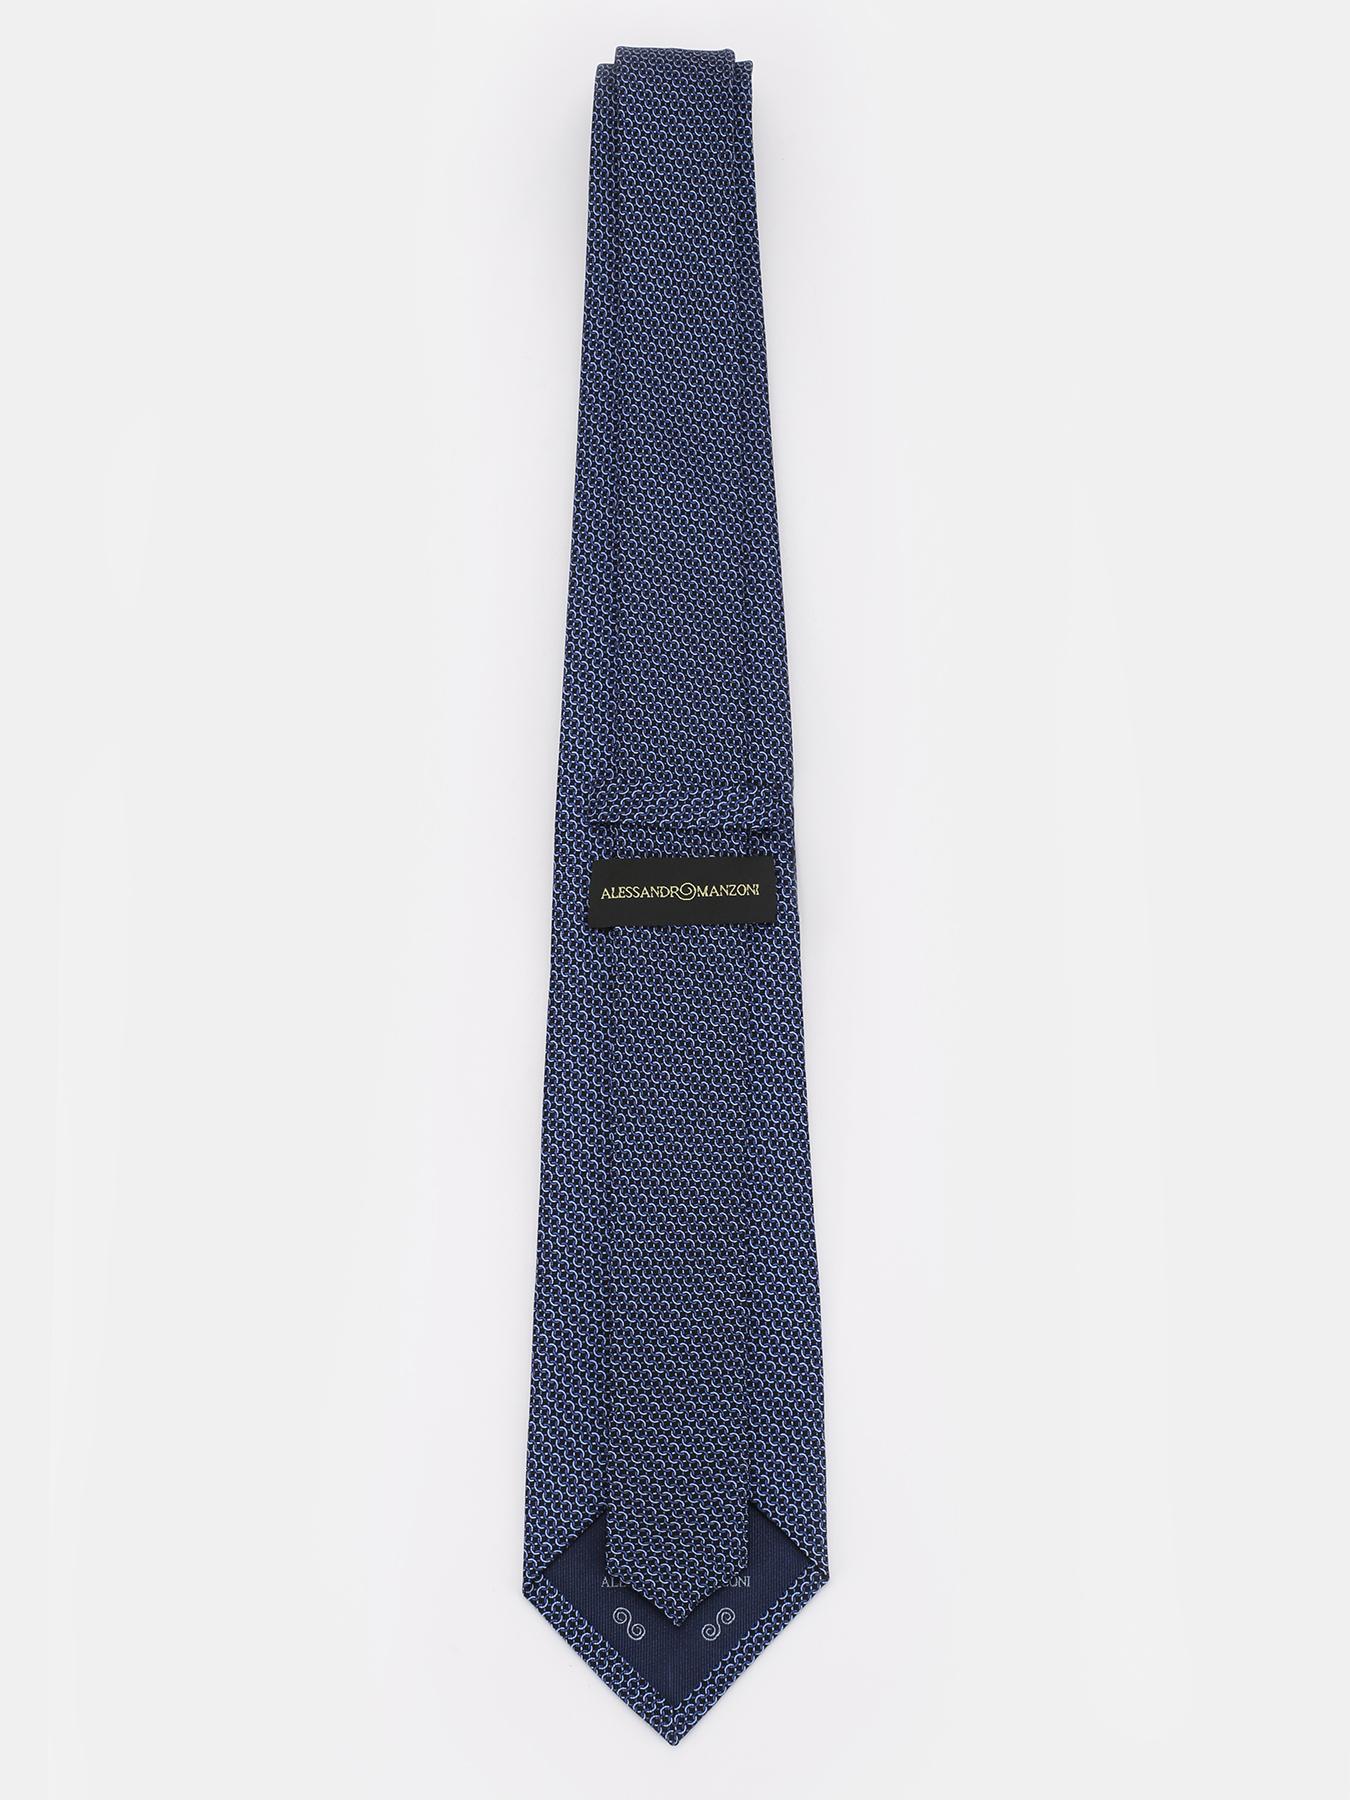 Alessandro Manzoni Шелковый галстук 312356-185 Фото 2